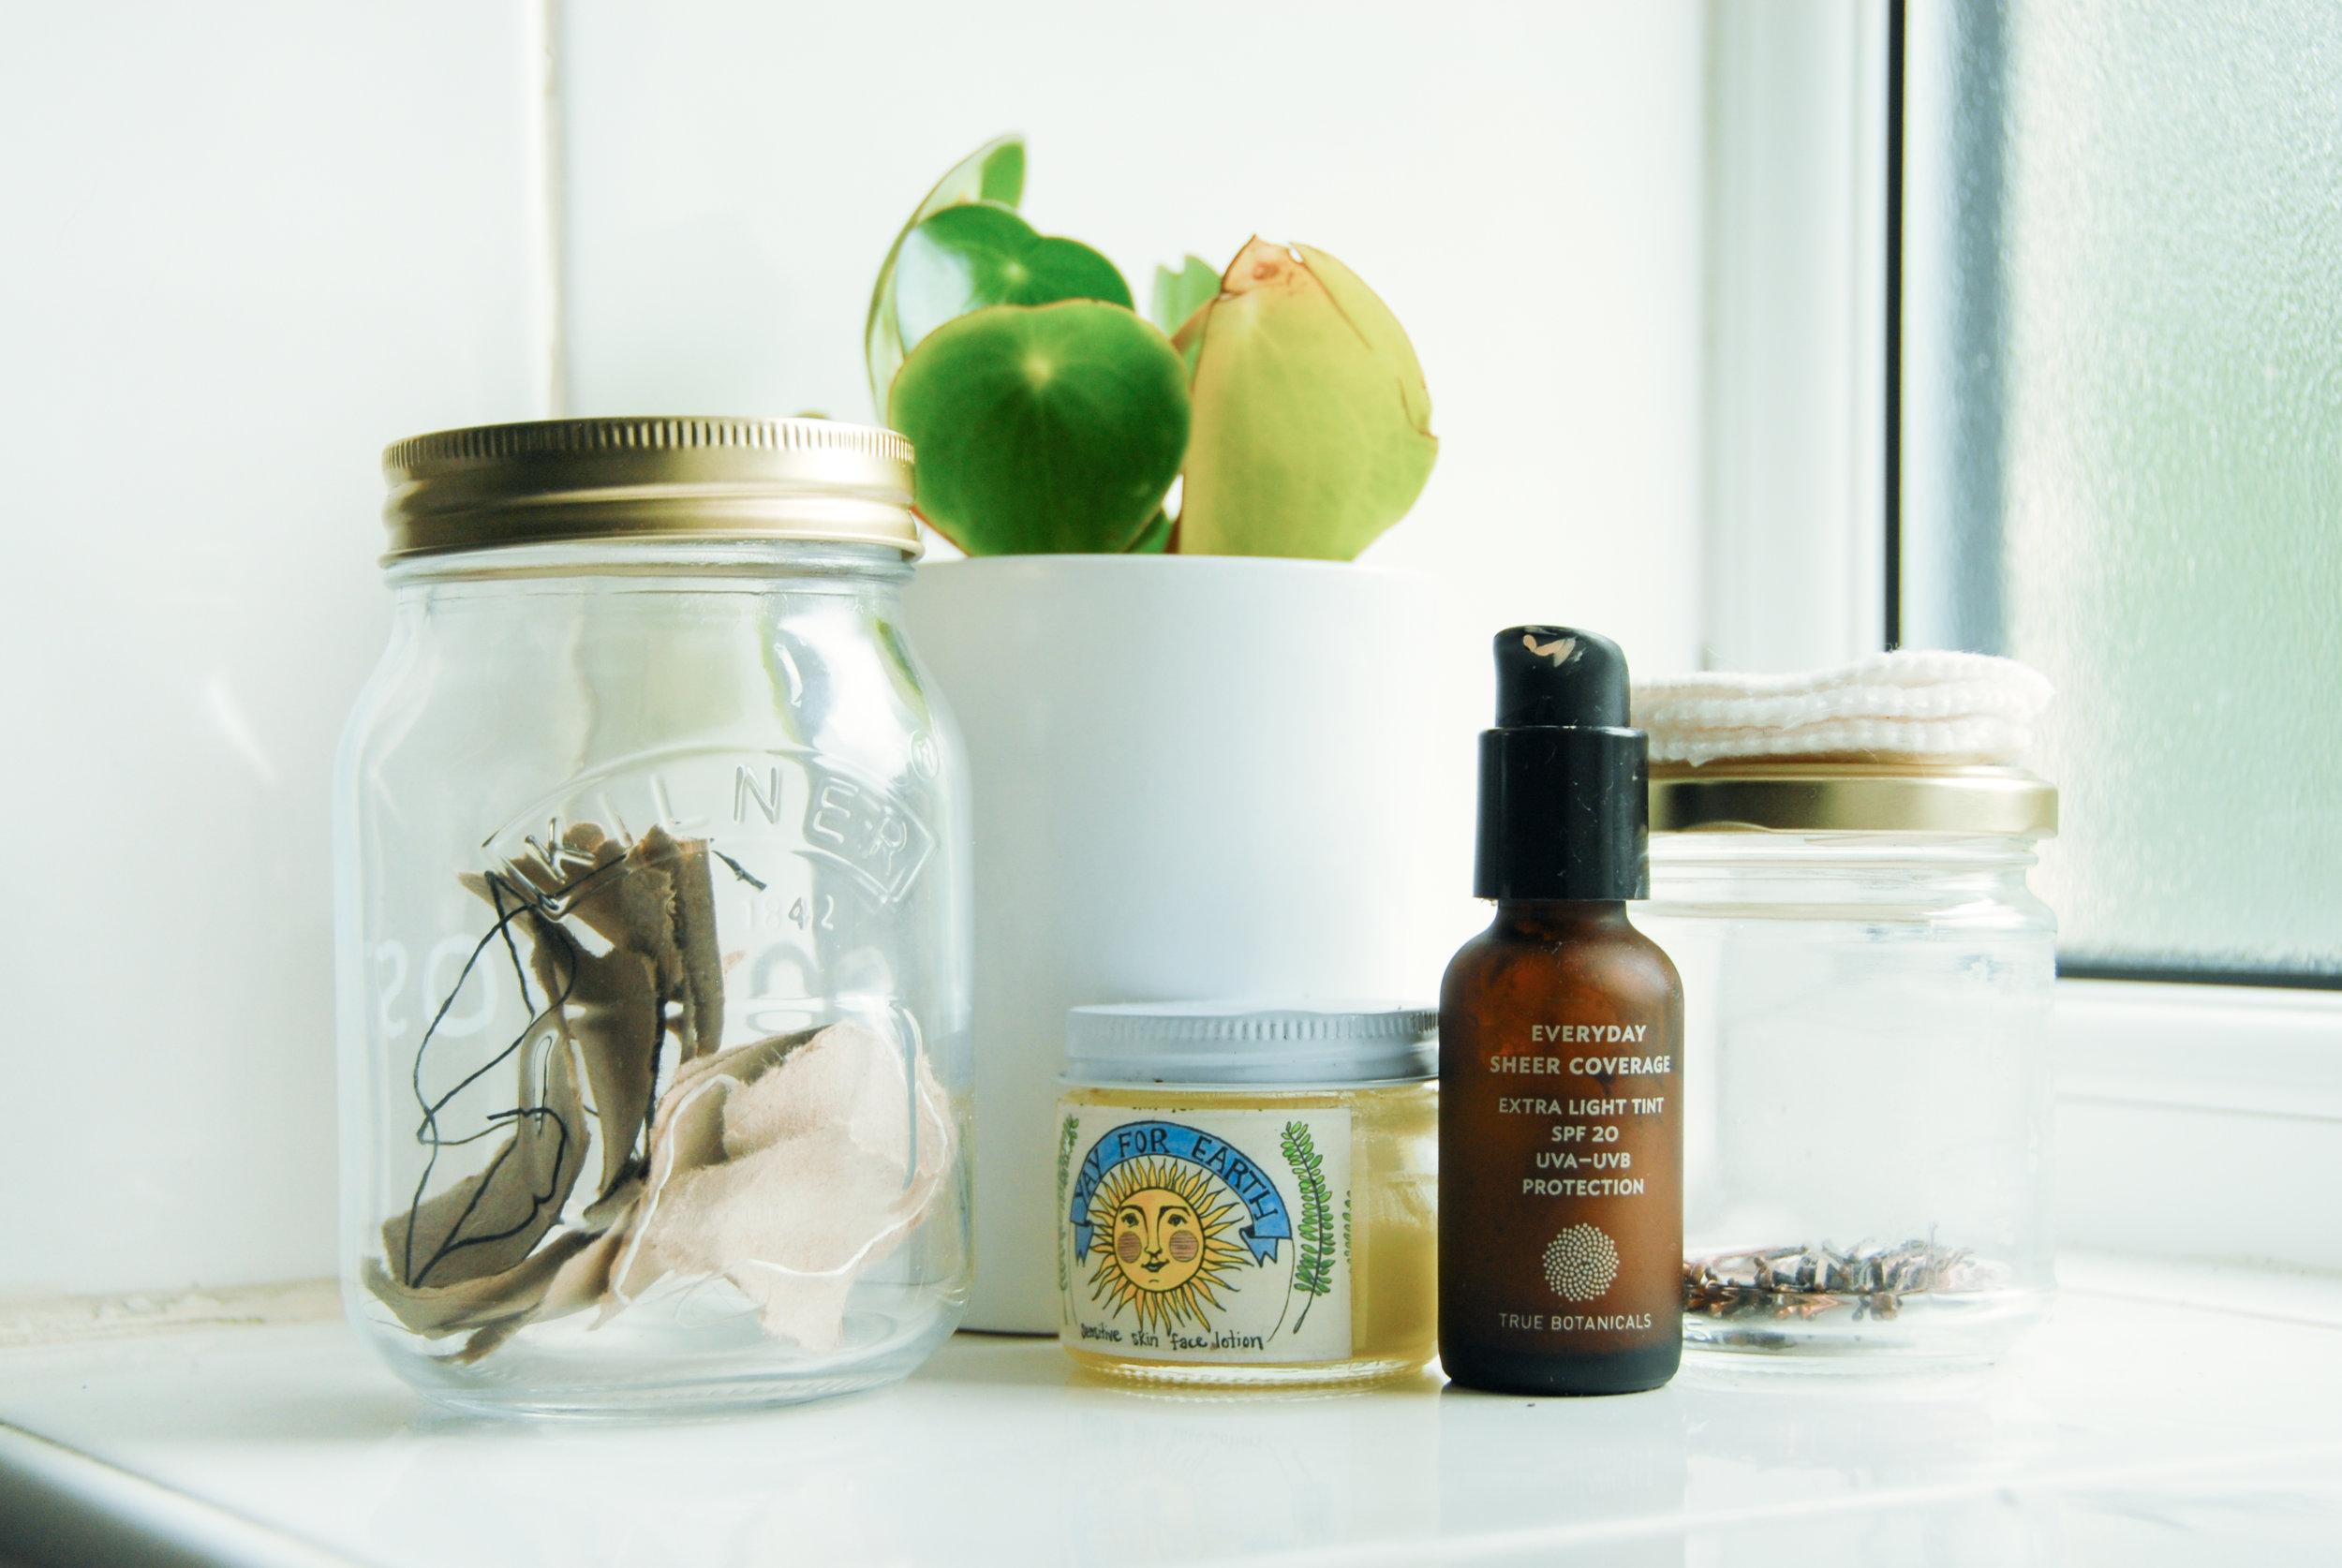 Bathroom compost jar